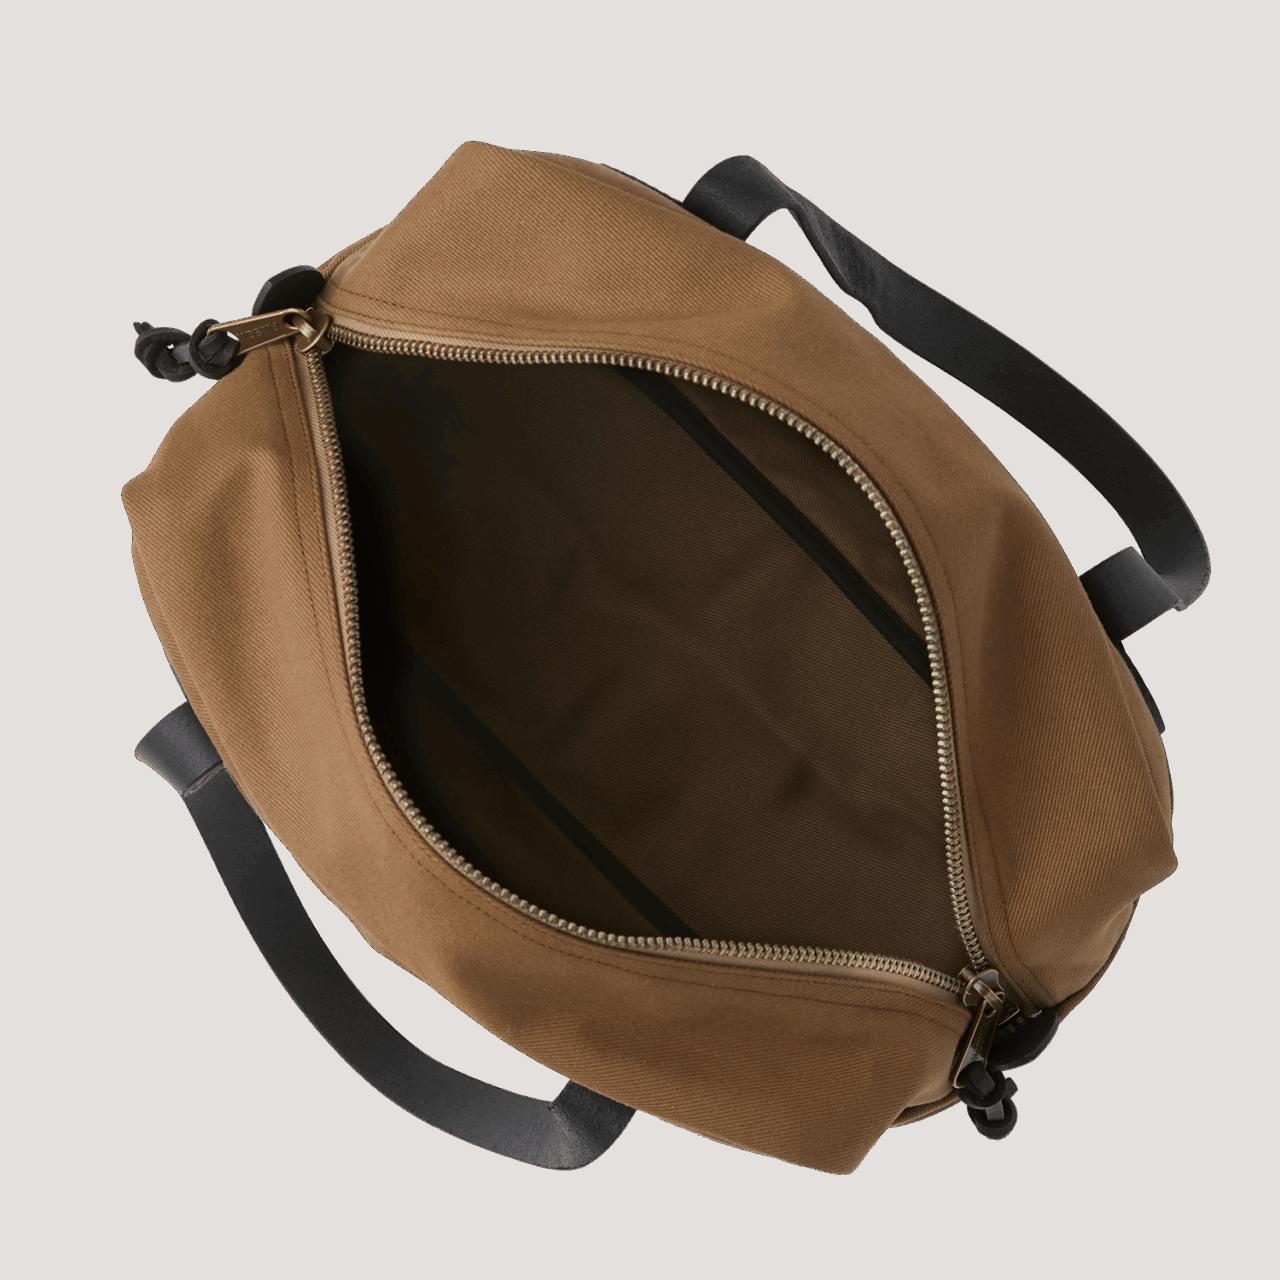 Filson Smokey Bear Zip Tote Bag - Sepia